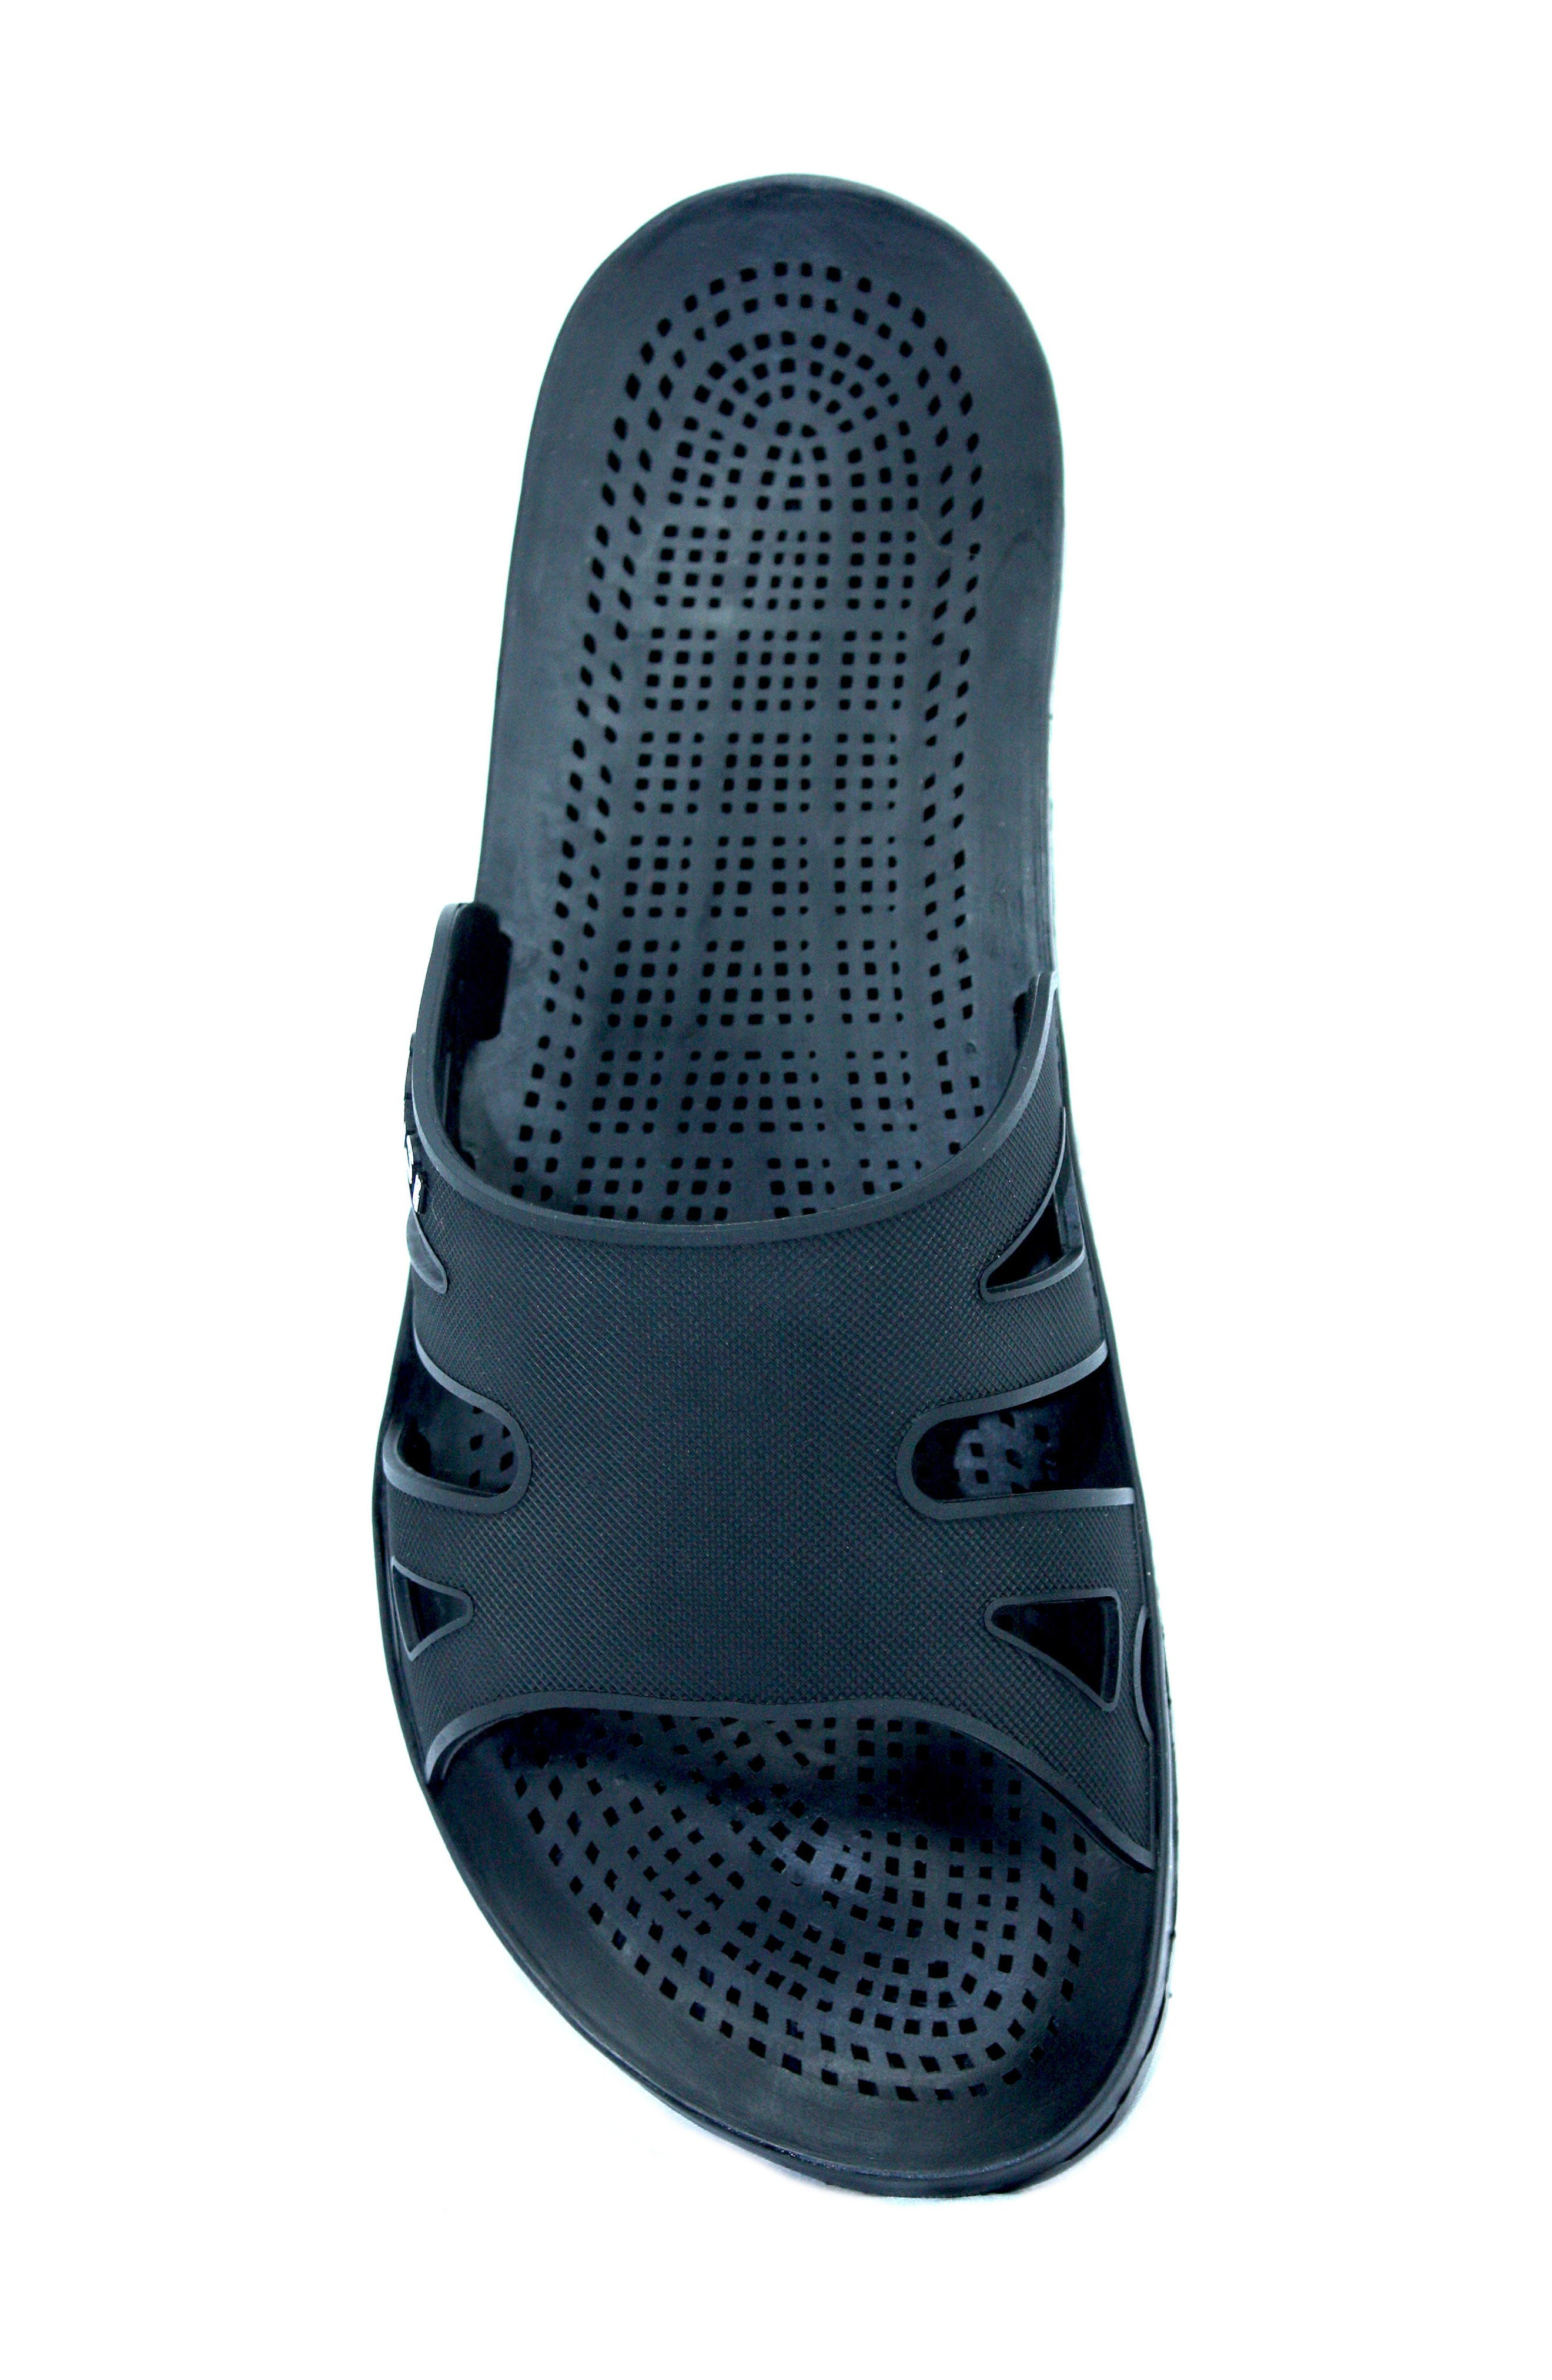 Regatta Slide Sandal,                             Alternate thumbnail 5, color,                             Solid Black Rubber